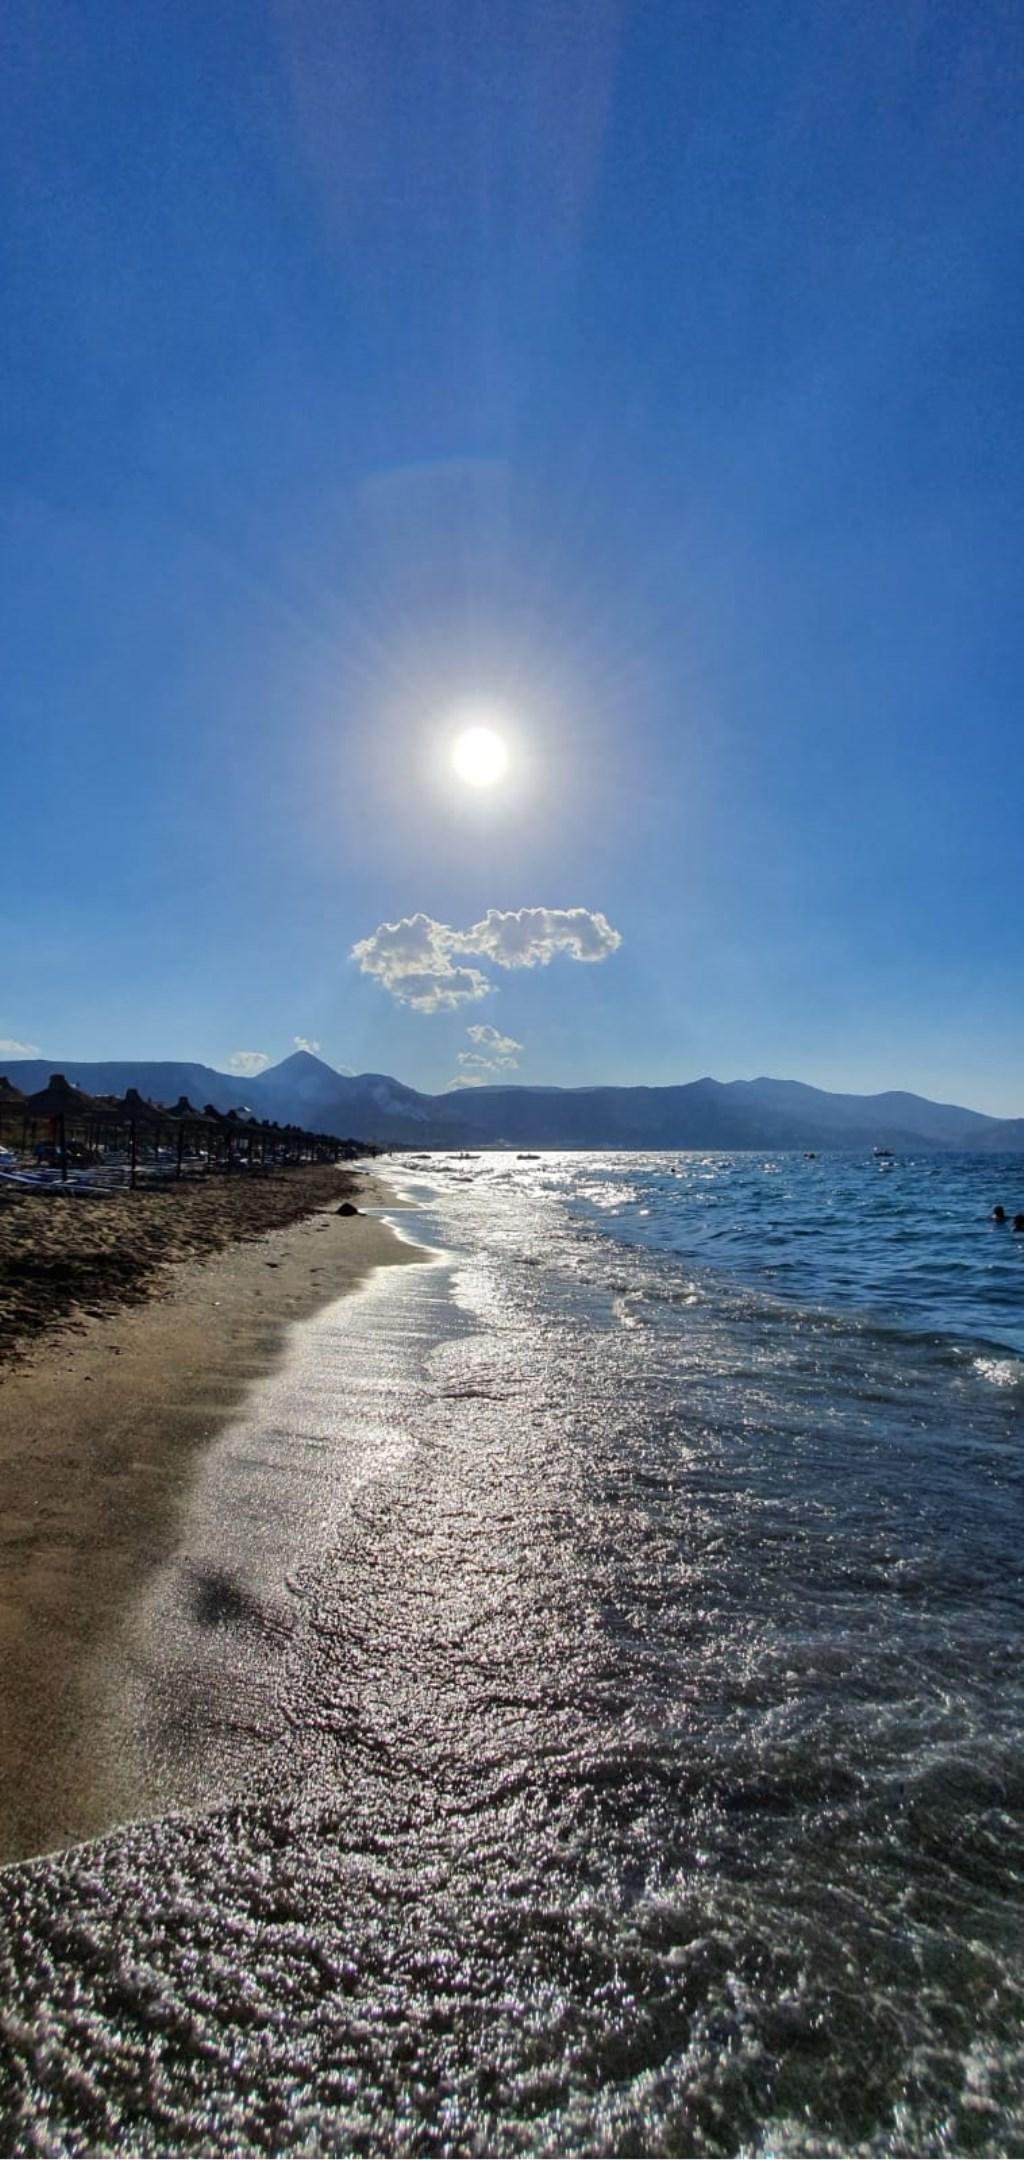 Groetjes uit Kreta. Bart Jansen  © MooiRooi